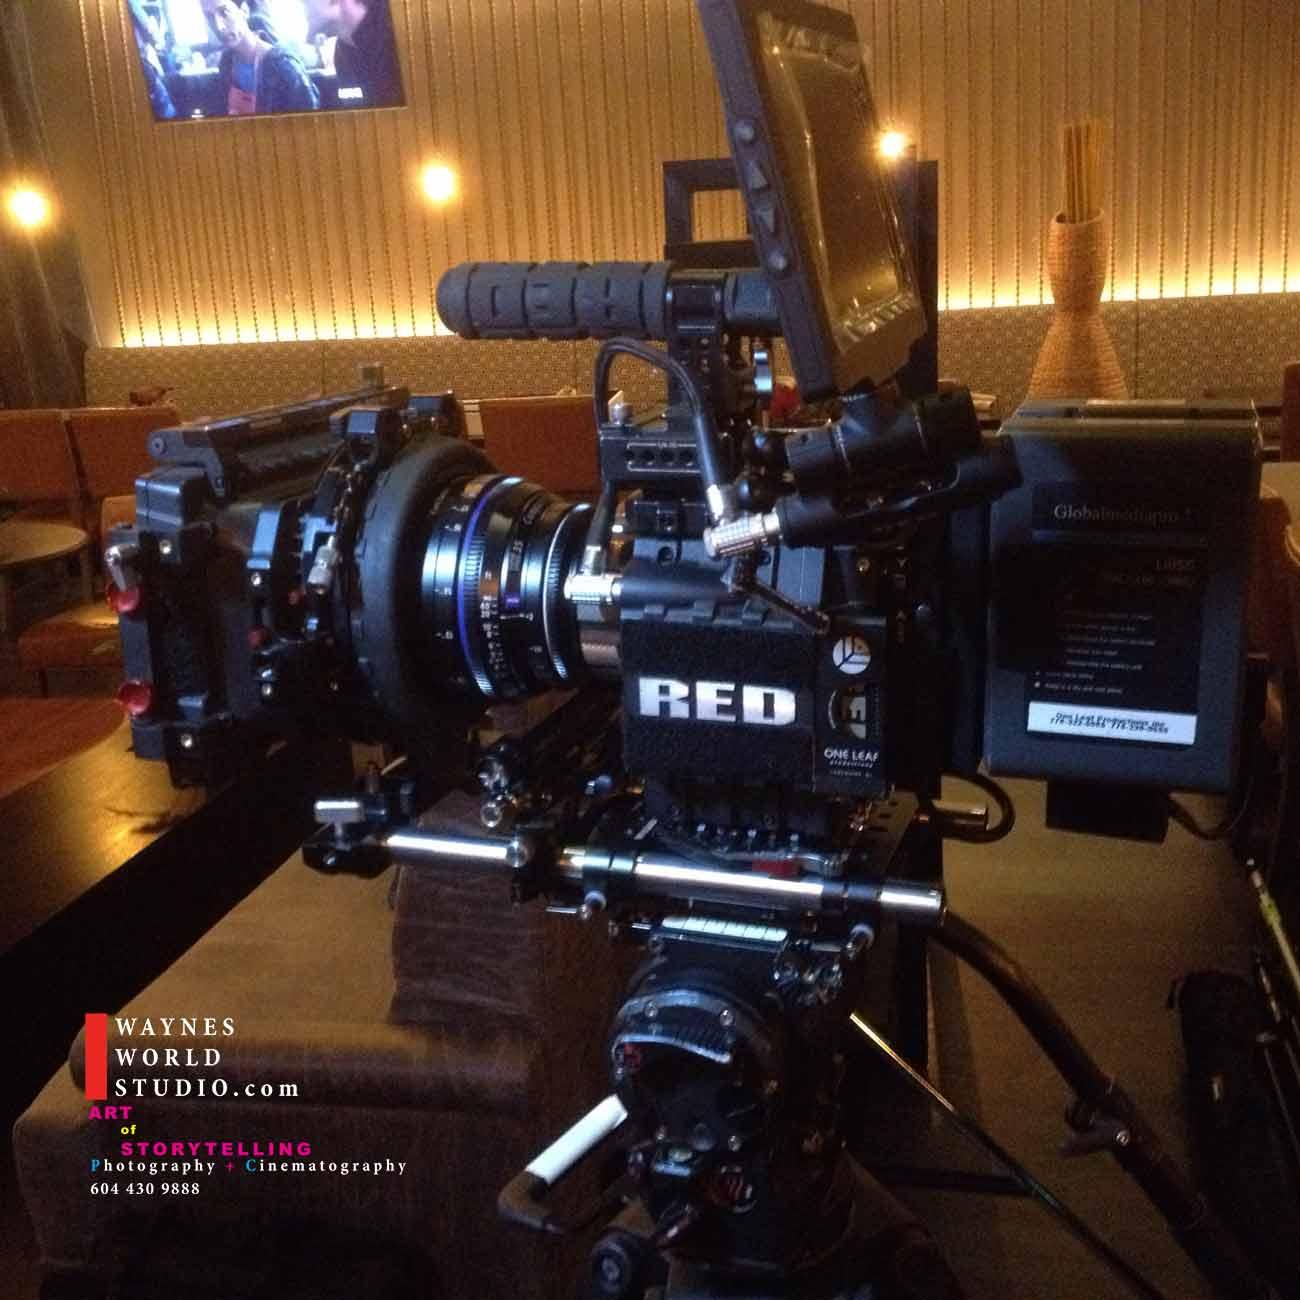 Vancouver BC filmmaker